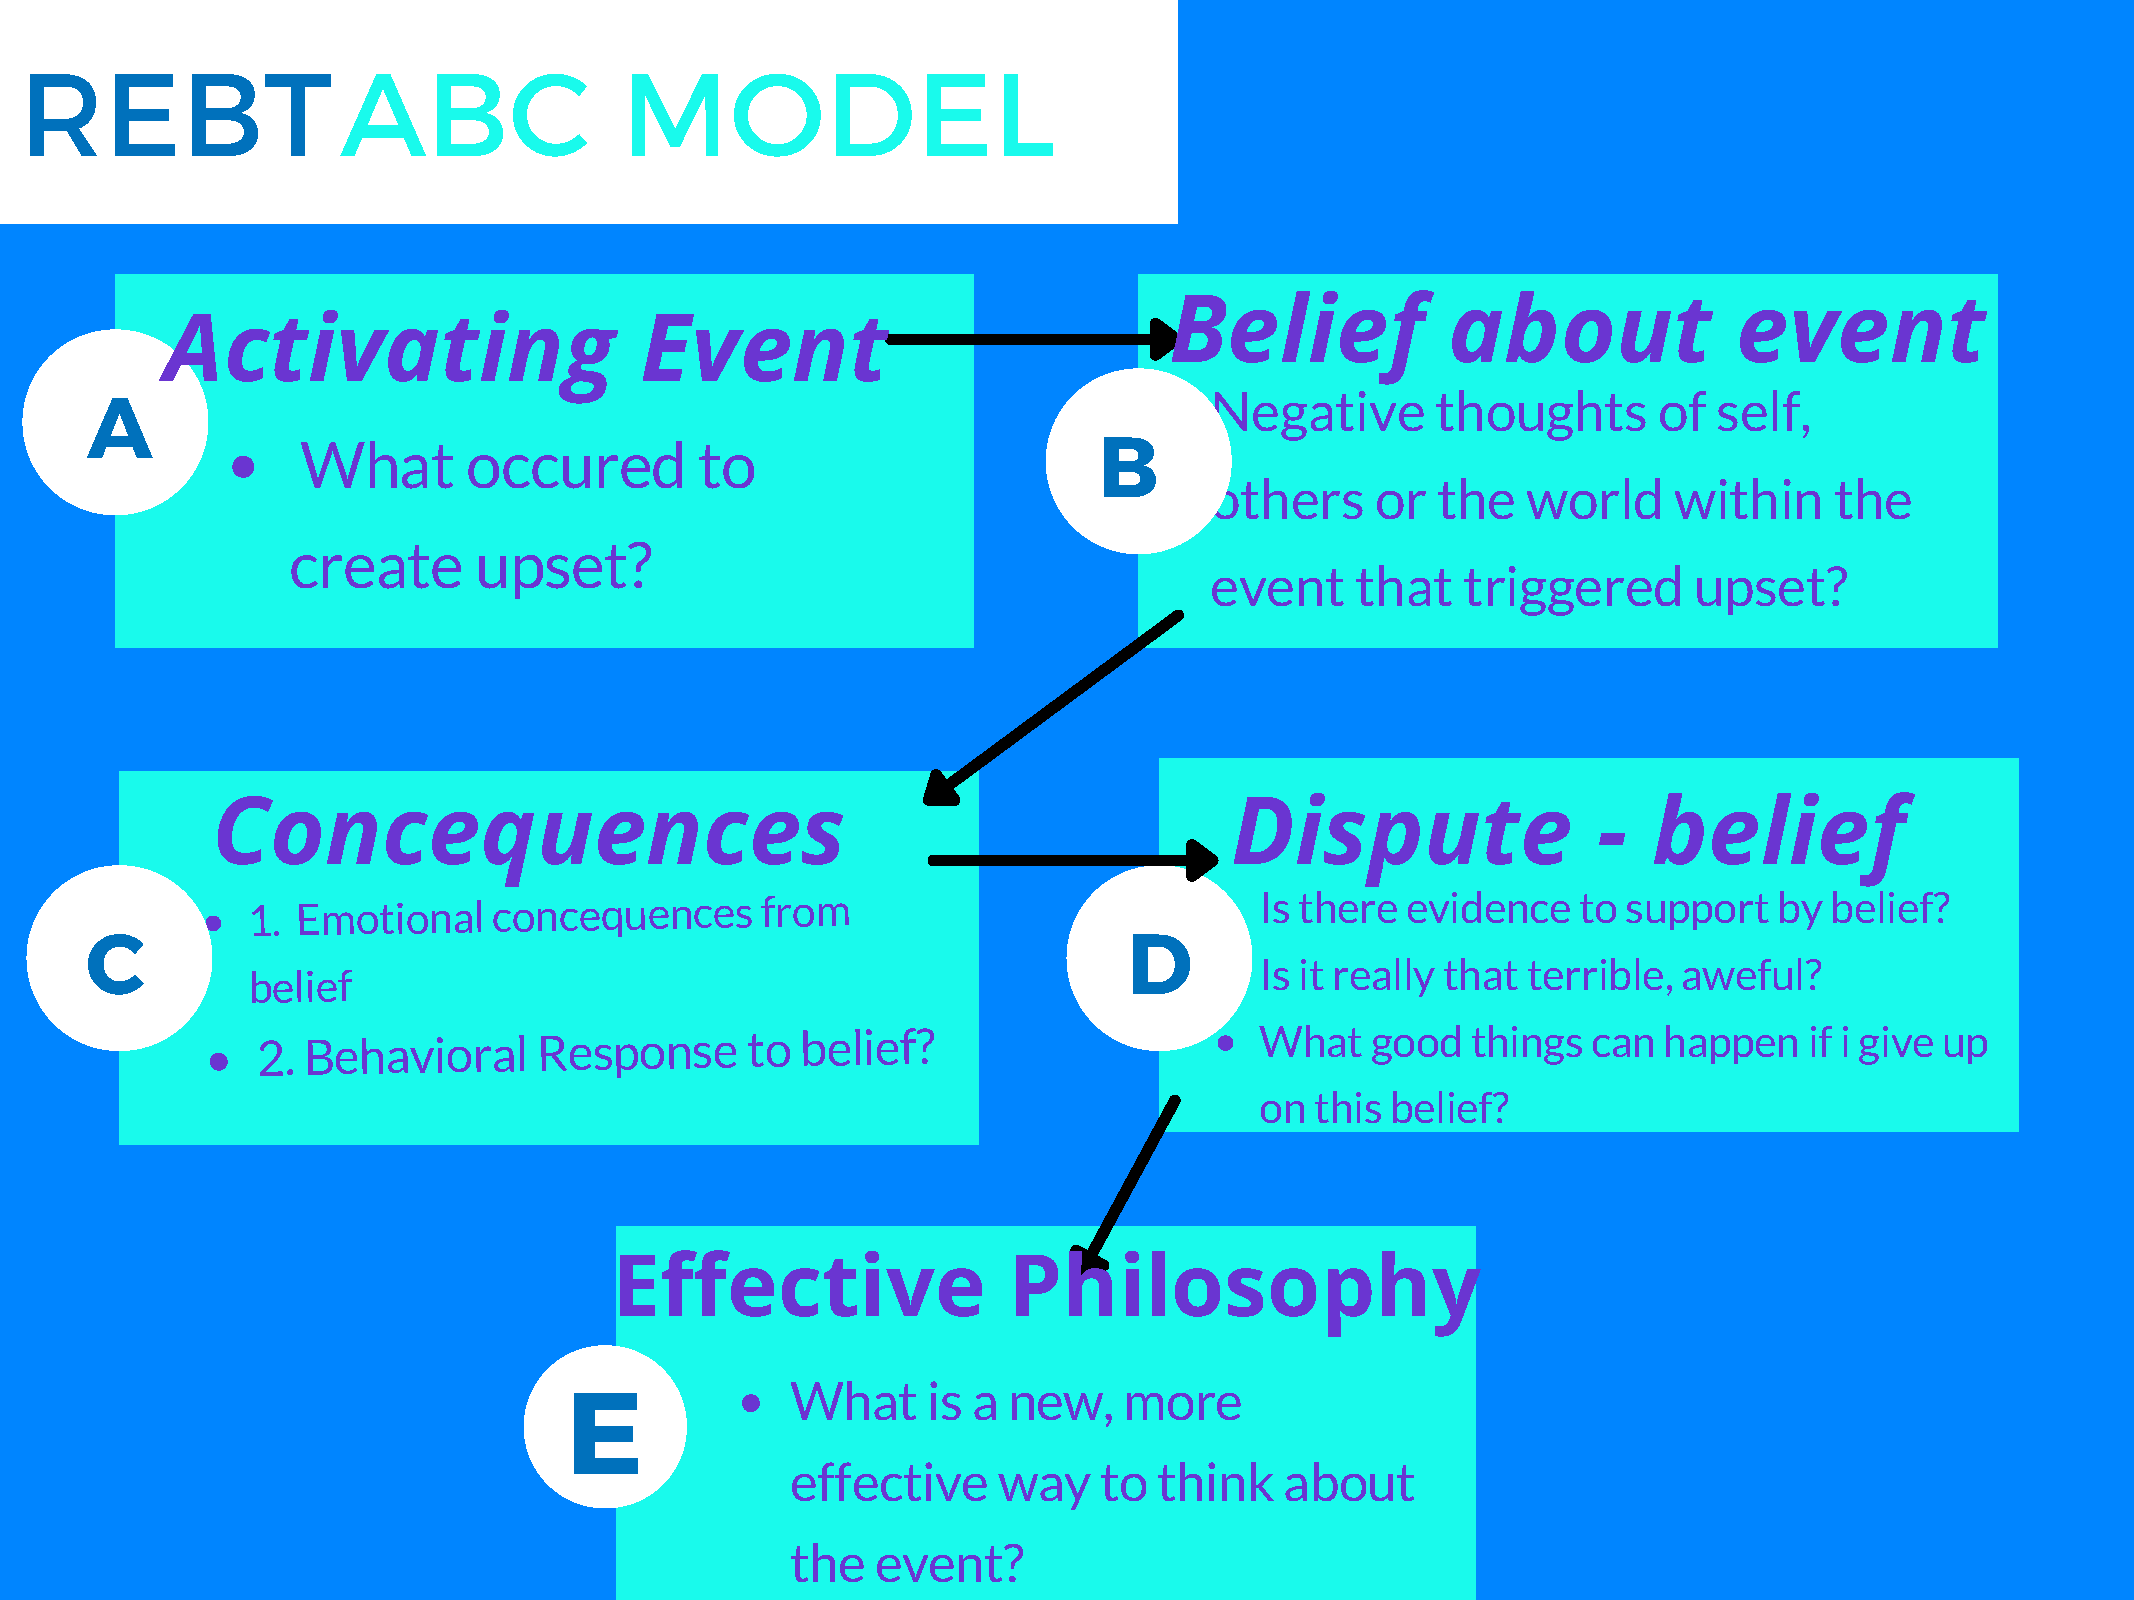 REBT ABC Model Diagram